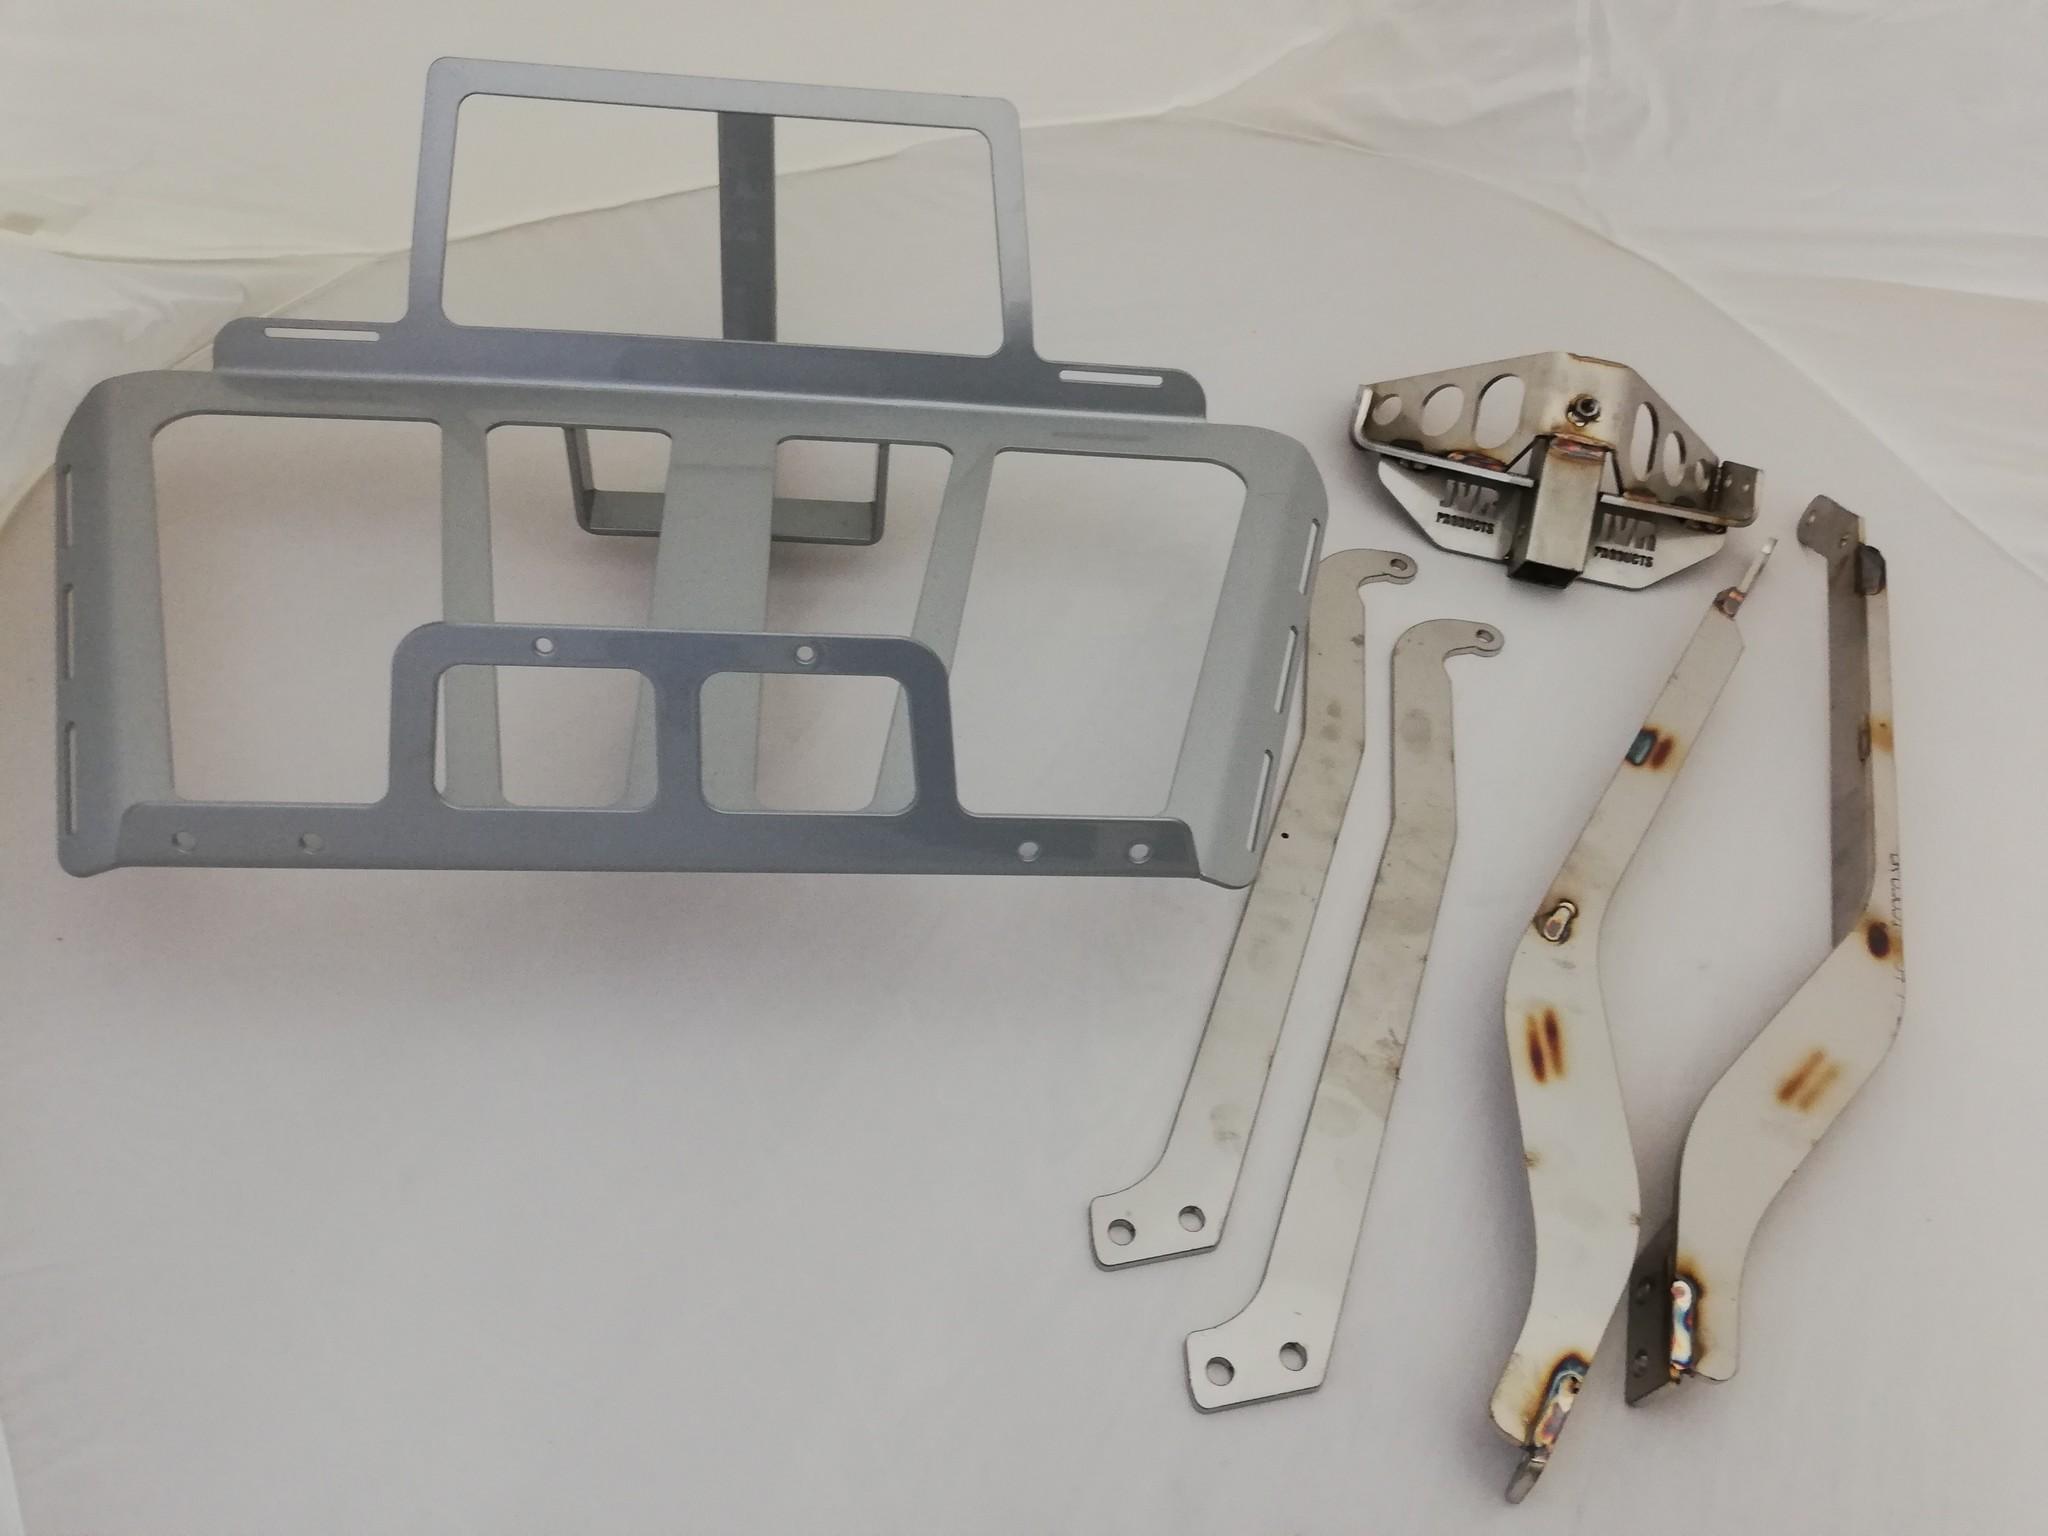 JVR Products Edelstahl-Heckträger GL1800 model 2018 Silbergrau